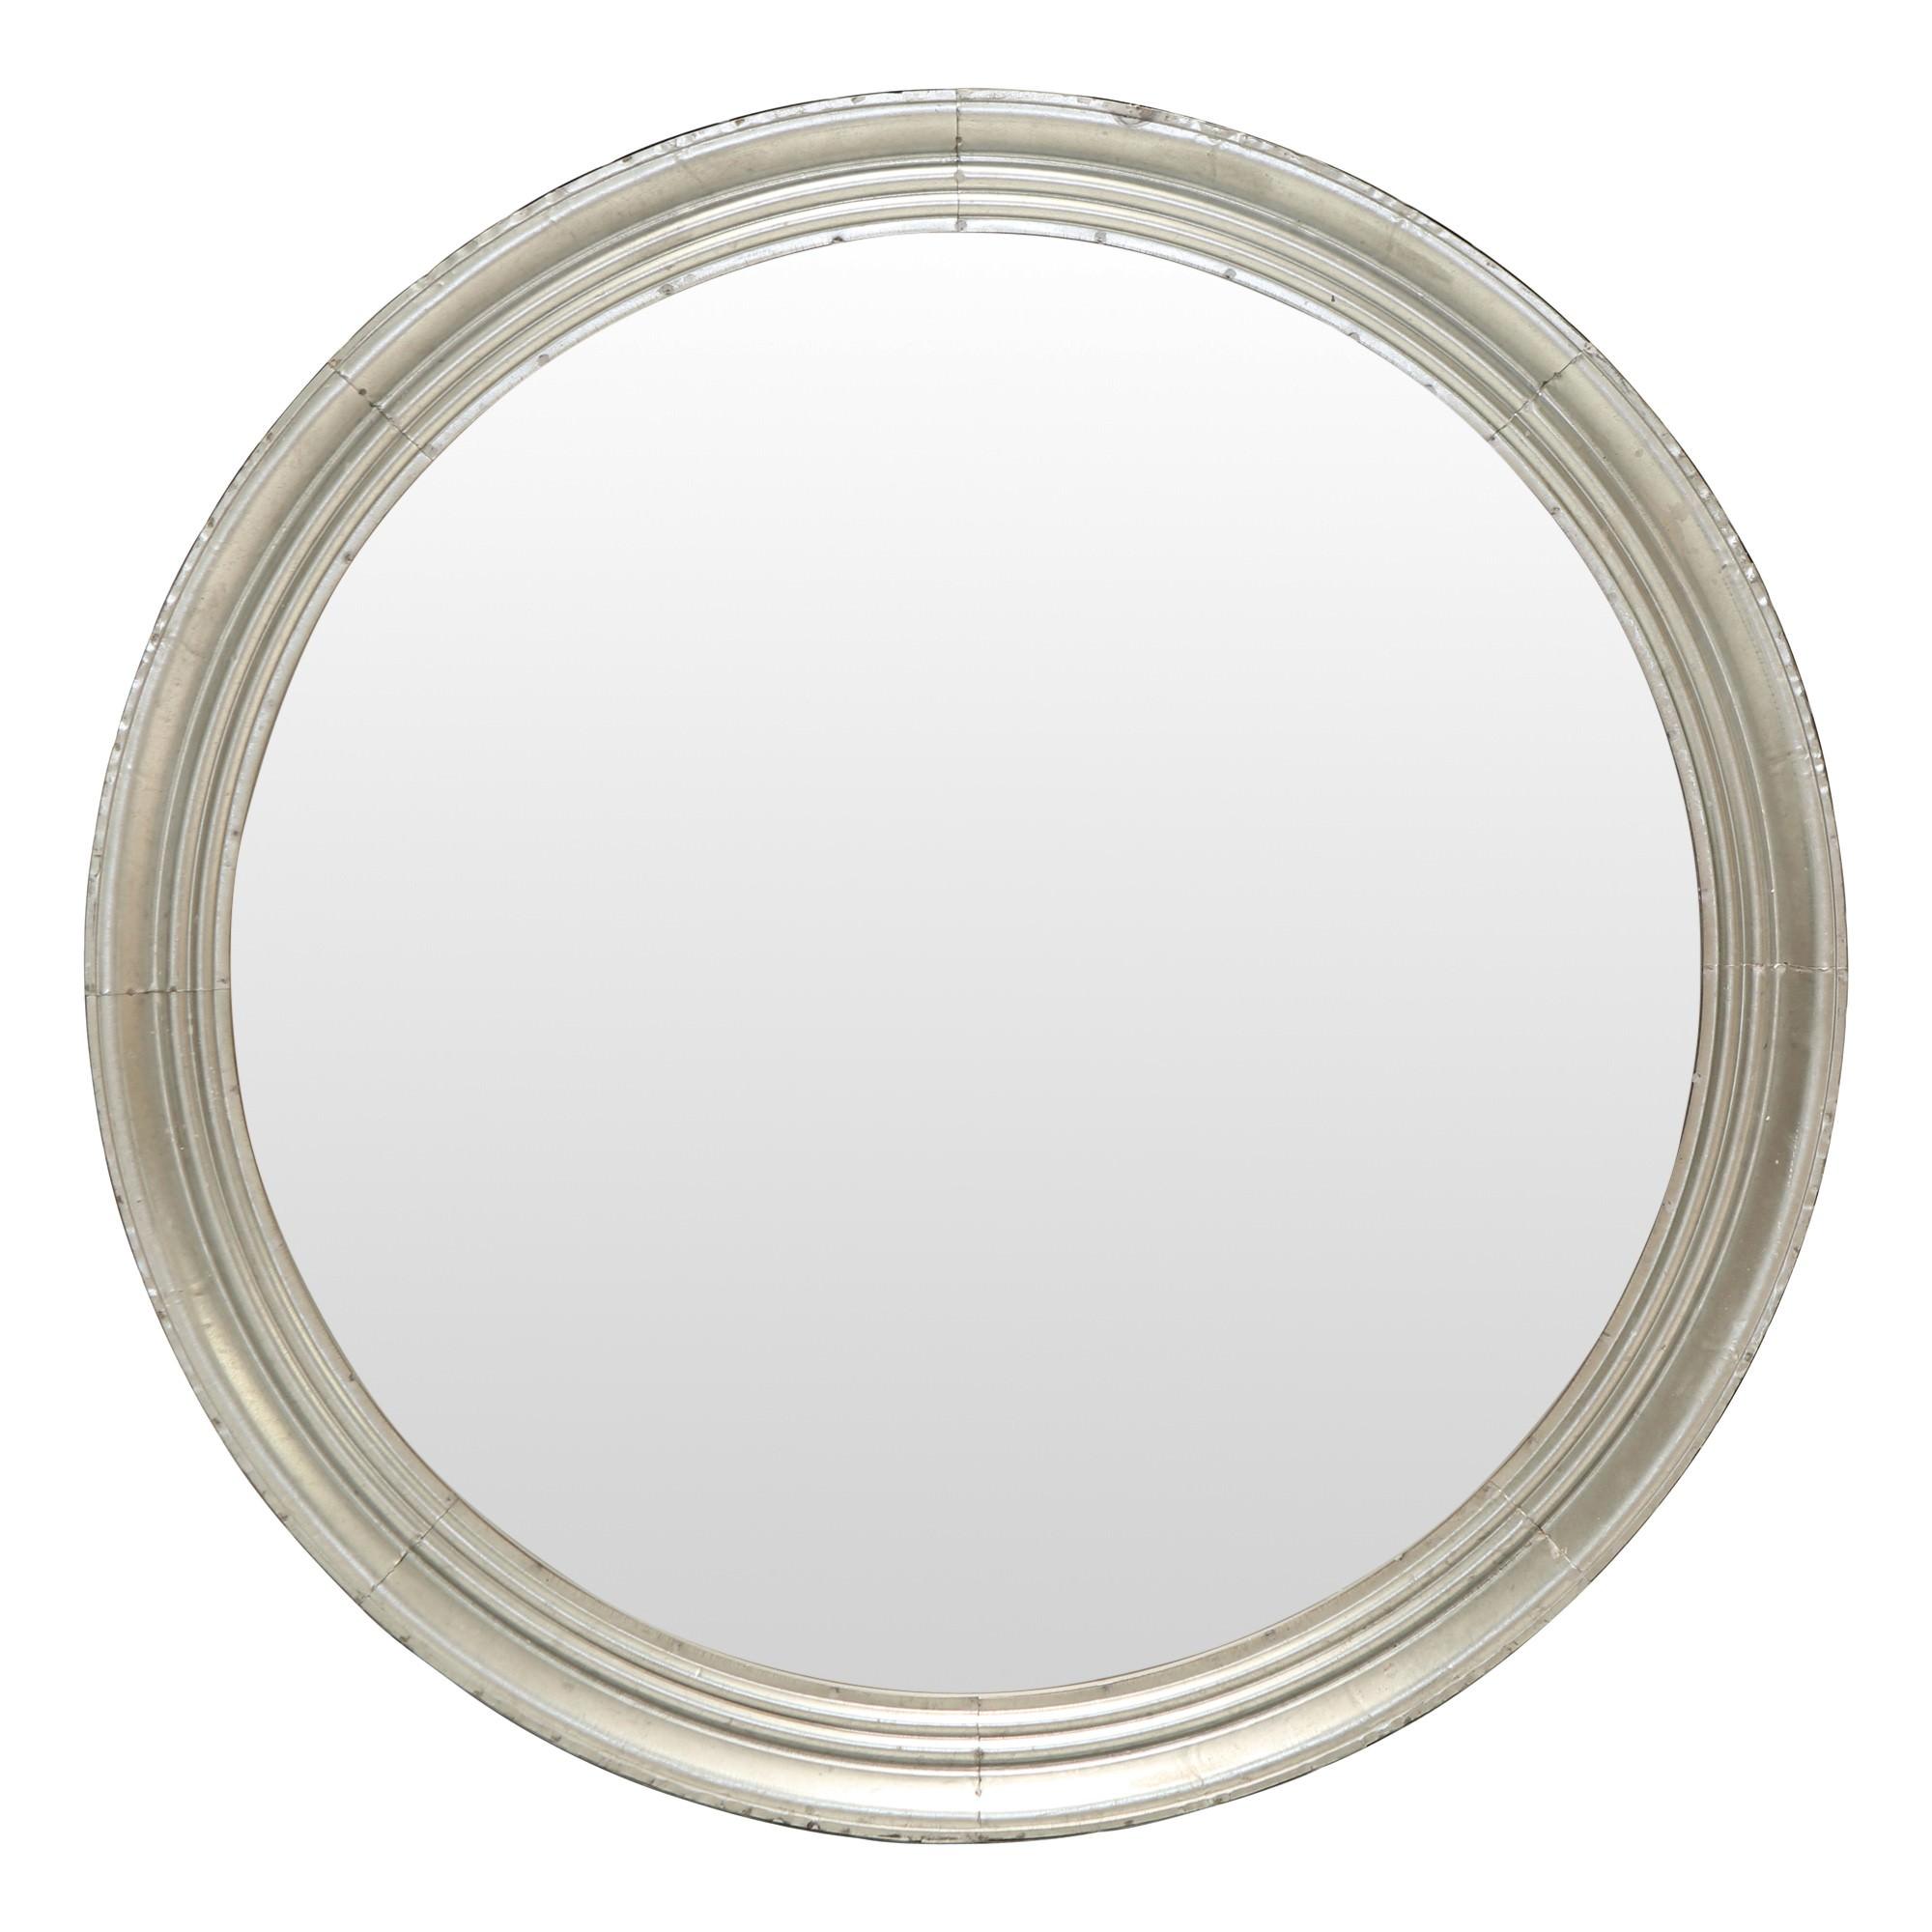 Adelaide Galvanised Iron Frame Round Wall Mirror, 90cm